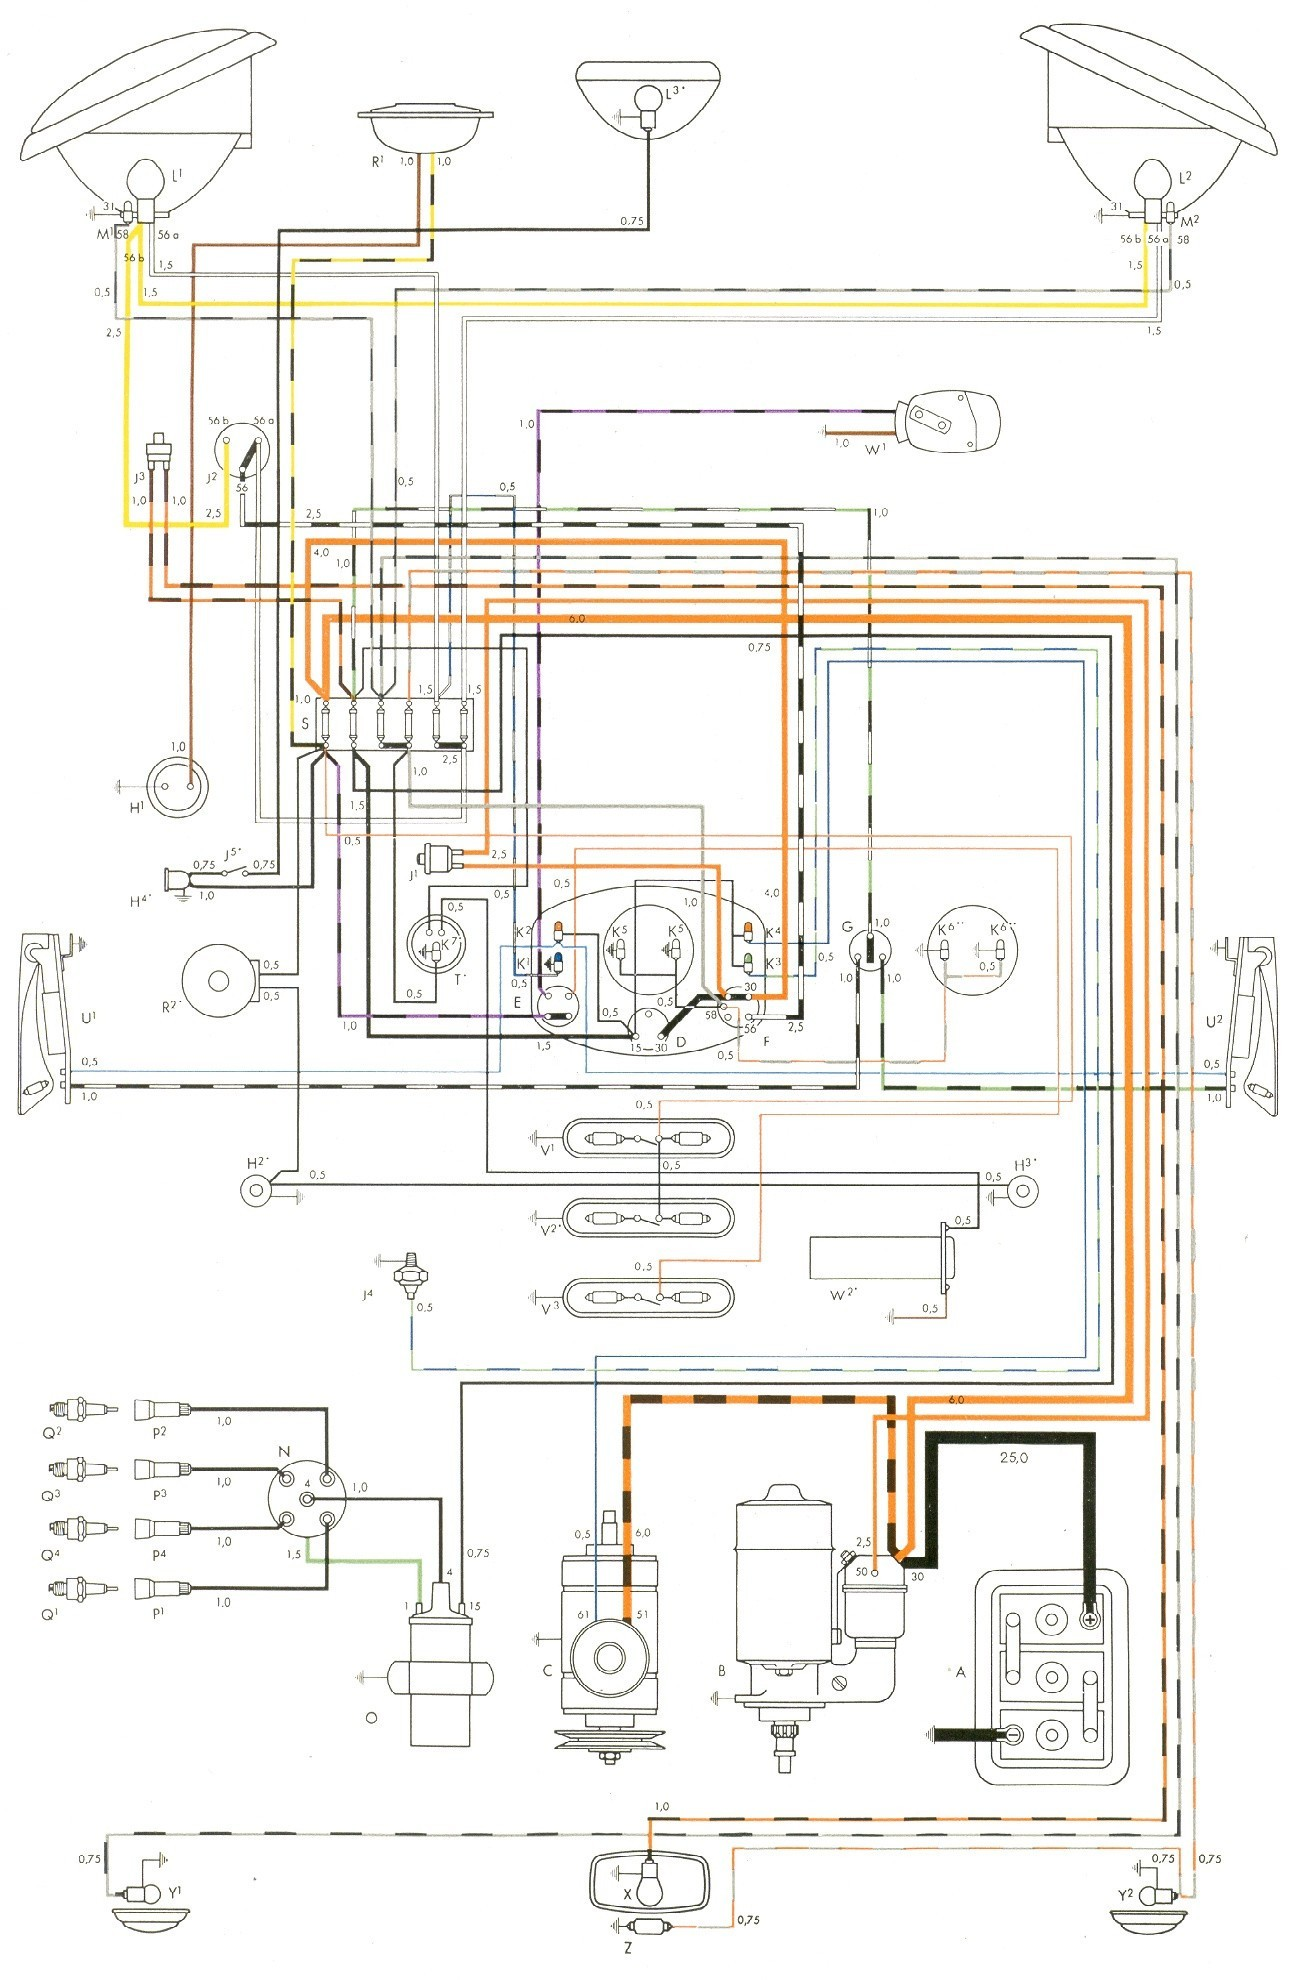 Vw Voltage Regulator Wiring Diagram 1973 Free For You Delco Simple Diagrams Rh 22 Studio011 De 1974 Alternator Snowmobile